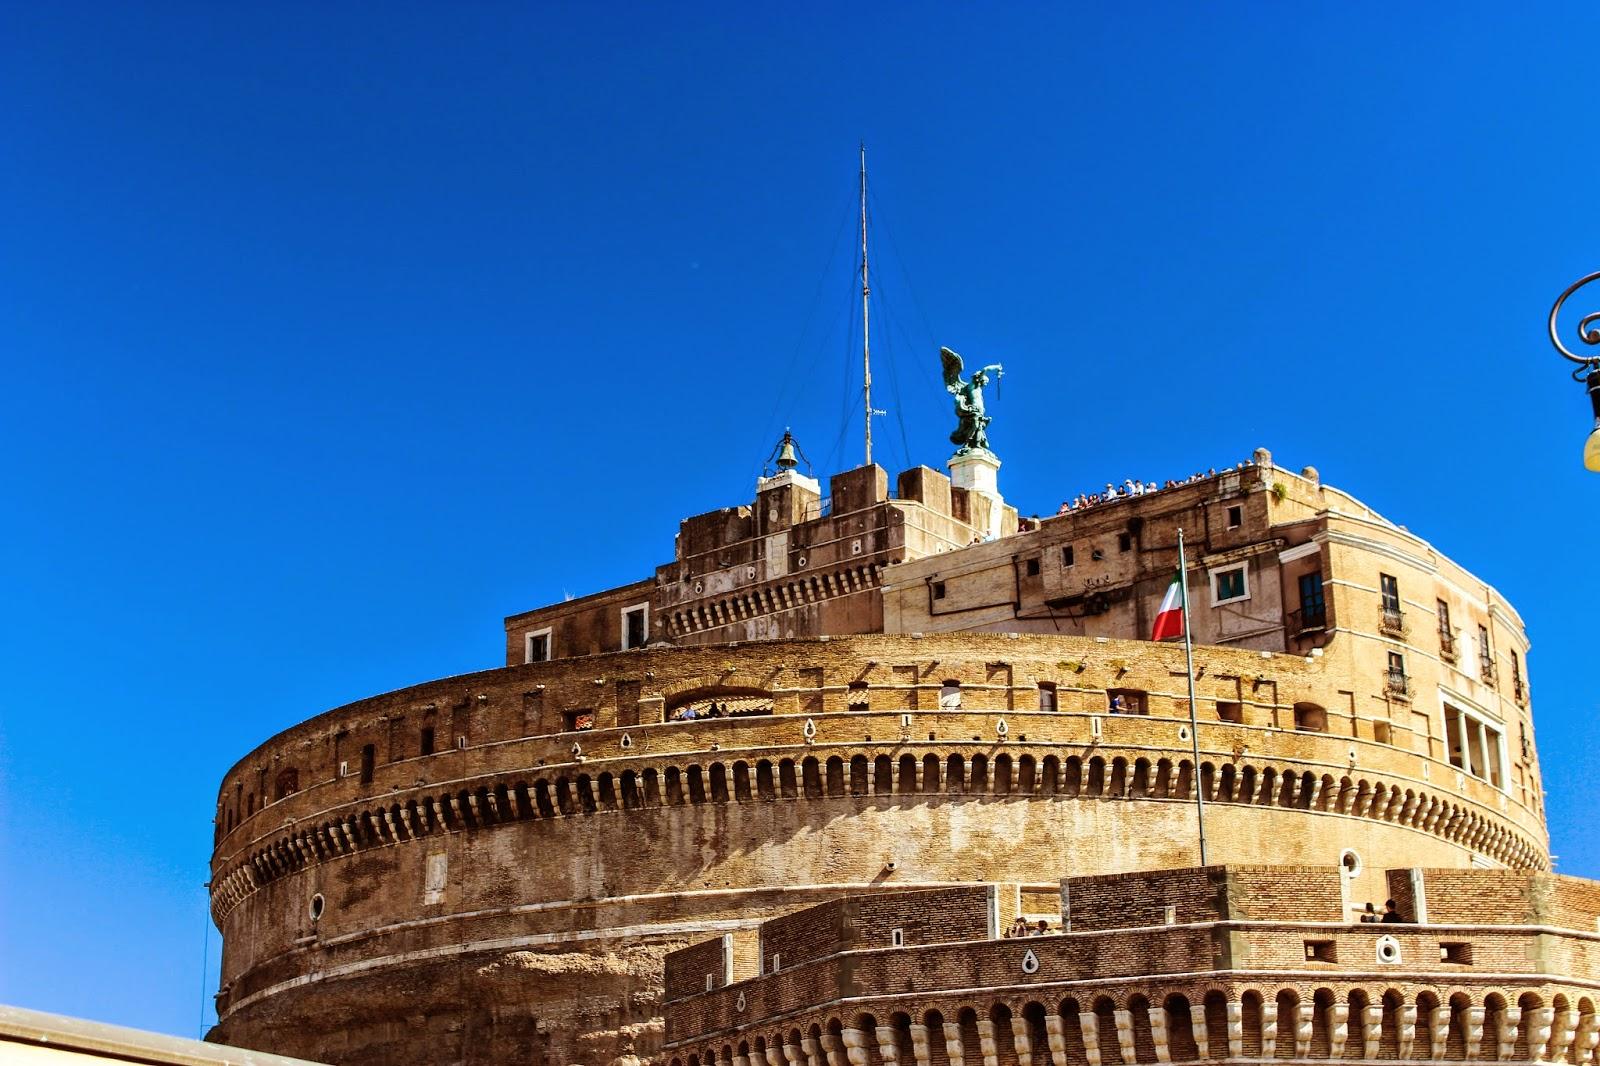 Drivin' Adair by Bimmer 09: Castel Sant' Angelo